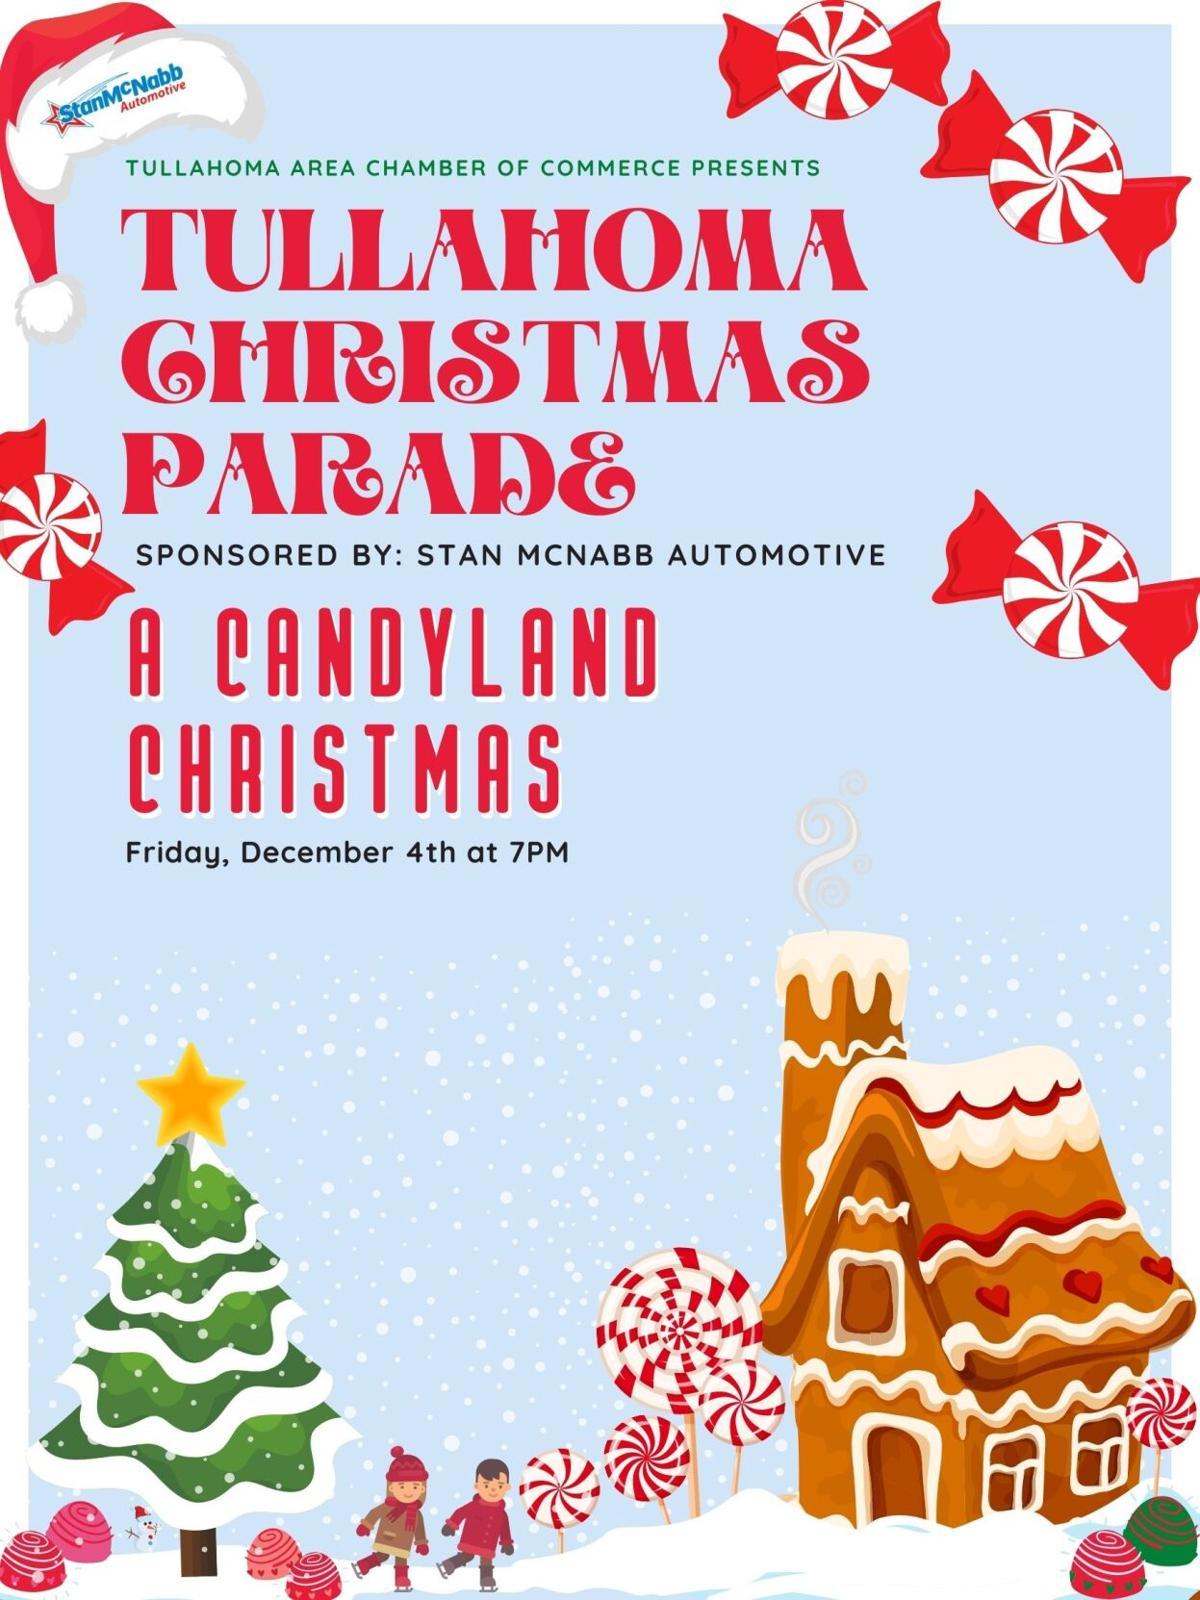 Mcminnville Tn Christmas Parade 2021 Registration Open For Tullahoma Christmas Parade Local News Tullahomanews Com